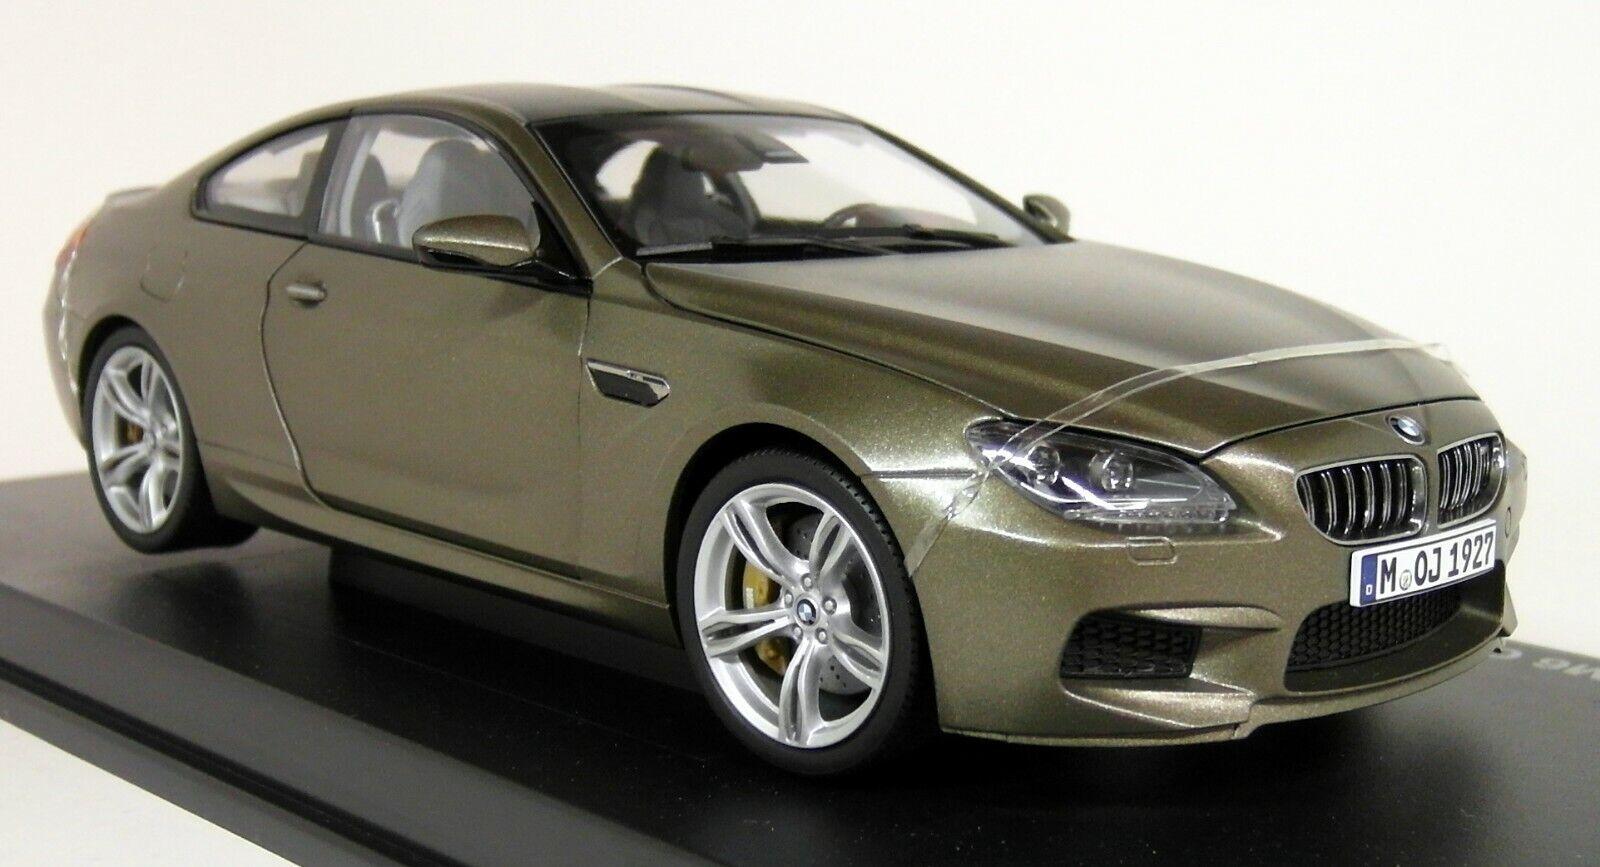 Esperando por ti Paragon escala 1 1 1 18 - BMW M6 Coupe (F13) coche modelo Diecast Bronce congelado  Entrega directa y rápida de fábrica